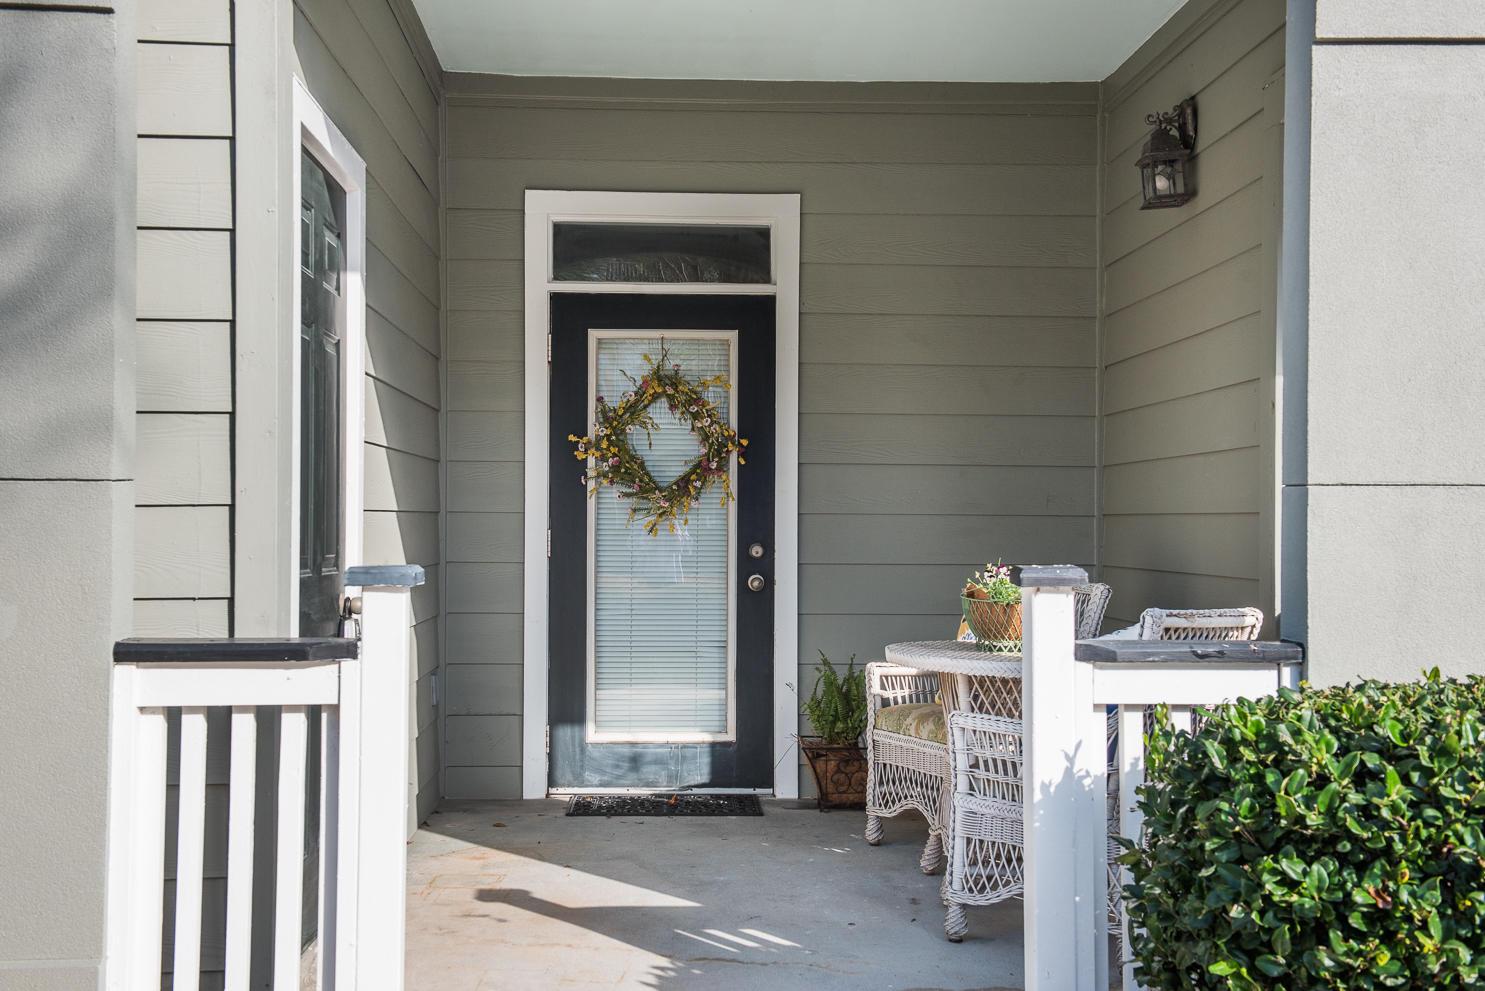 Daniel Landing Condos Homes For Sale - 130 River Landing, Charleston, SC - 32